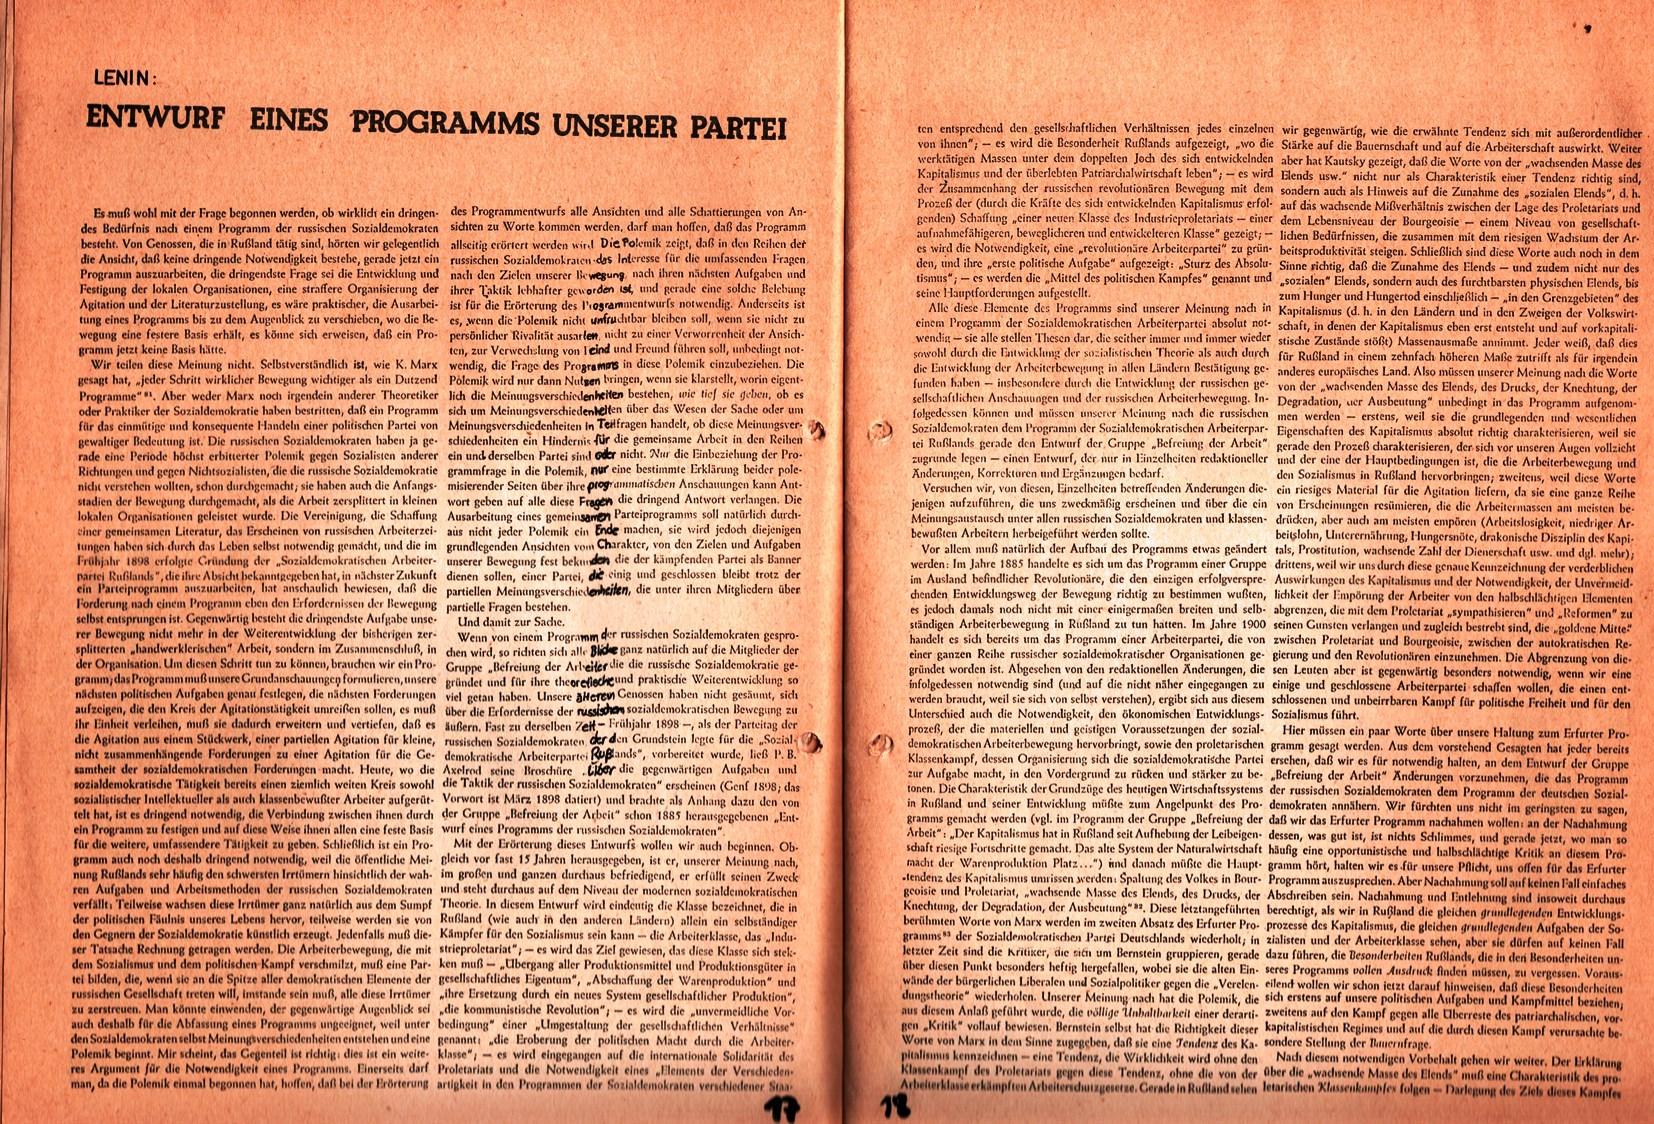 KSV_1974_Materialien_zur_Programmdiskussion_01_010